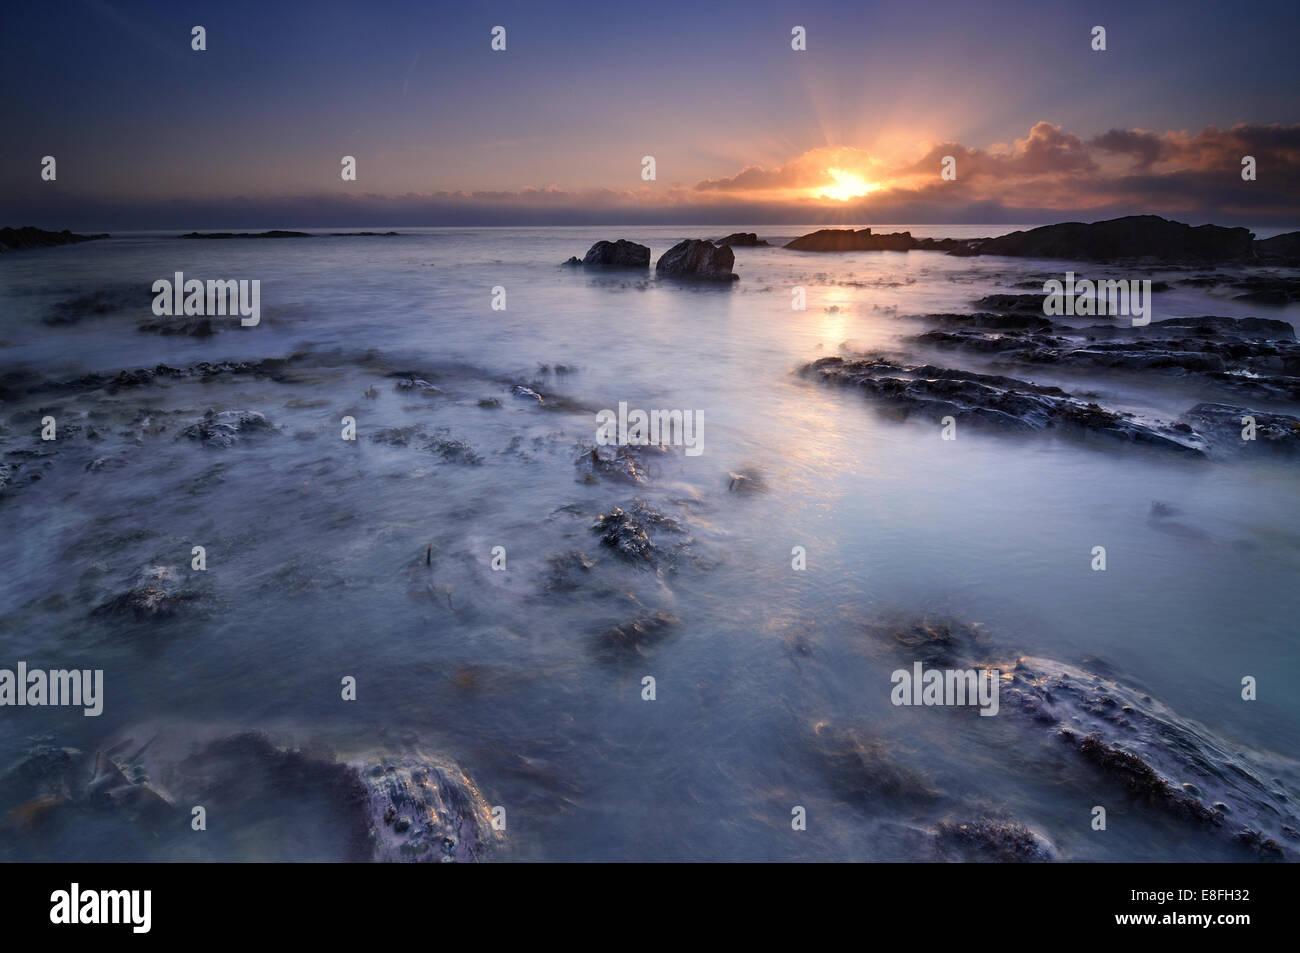 Finland, Pirkanmaa, Tampere, Sunrise over ocean - Stock Image